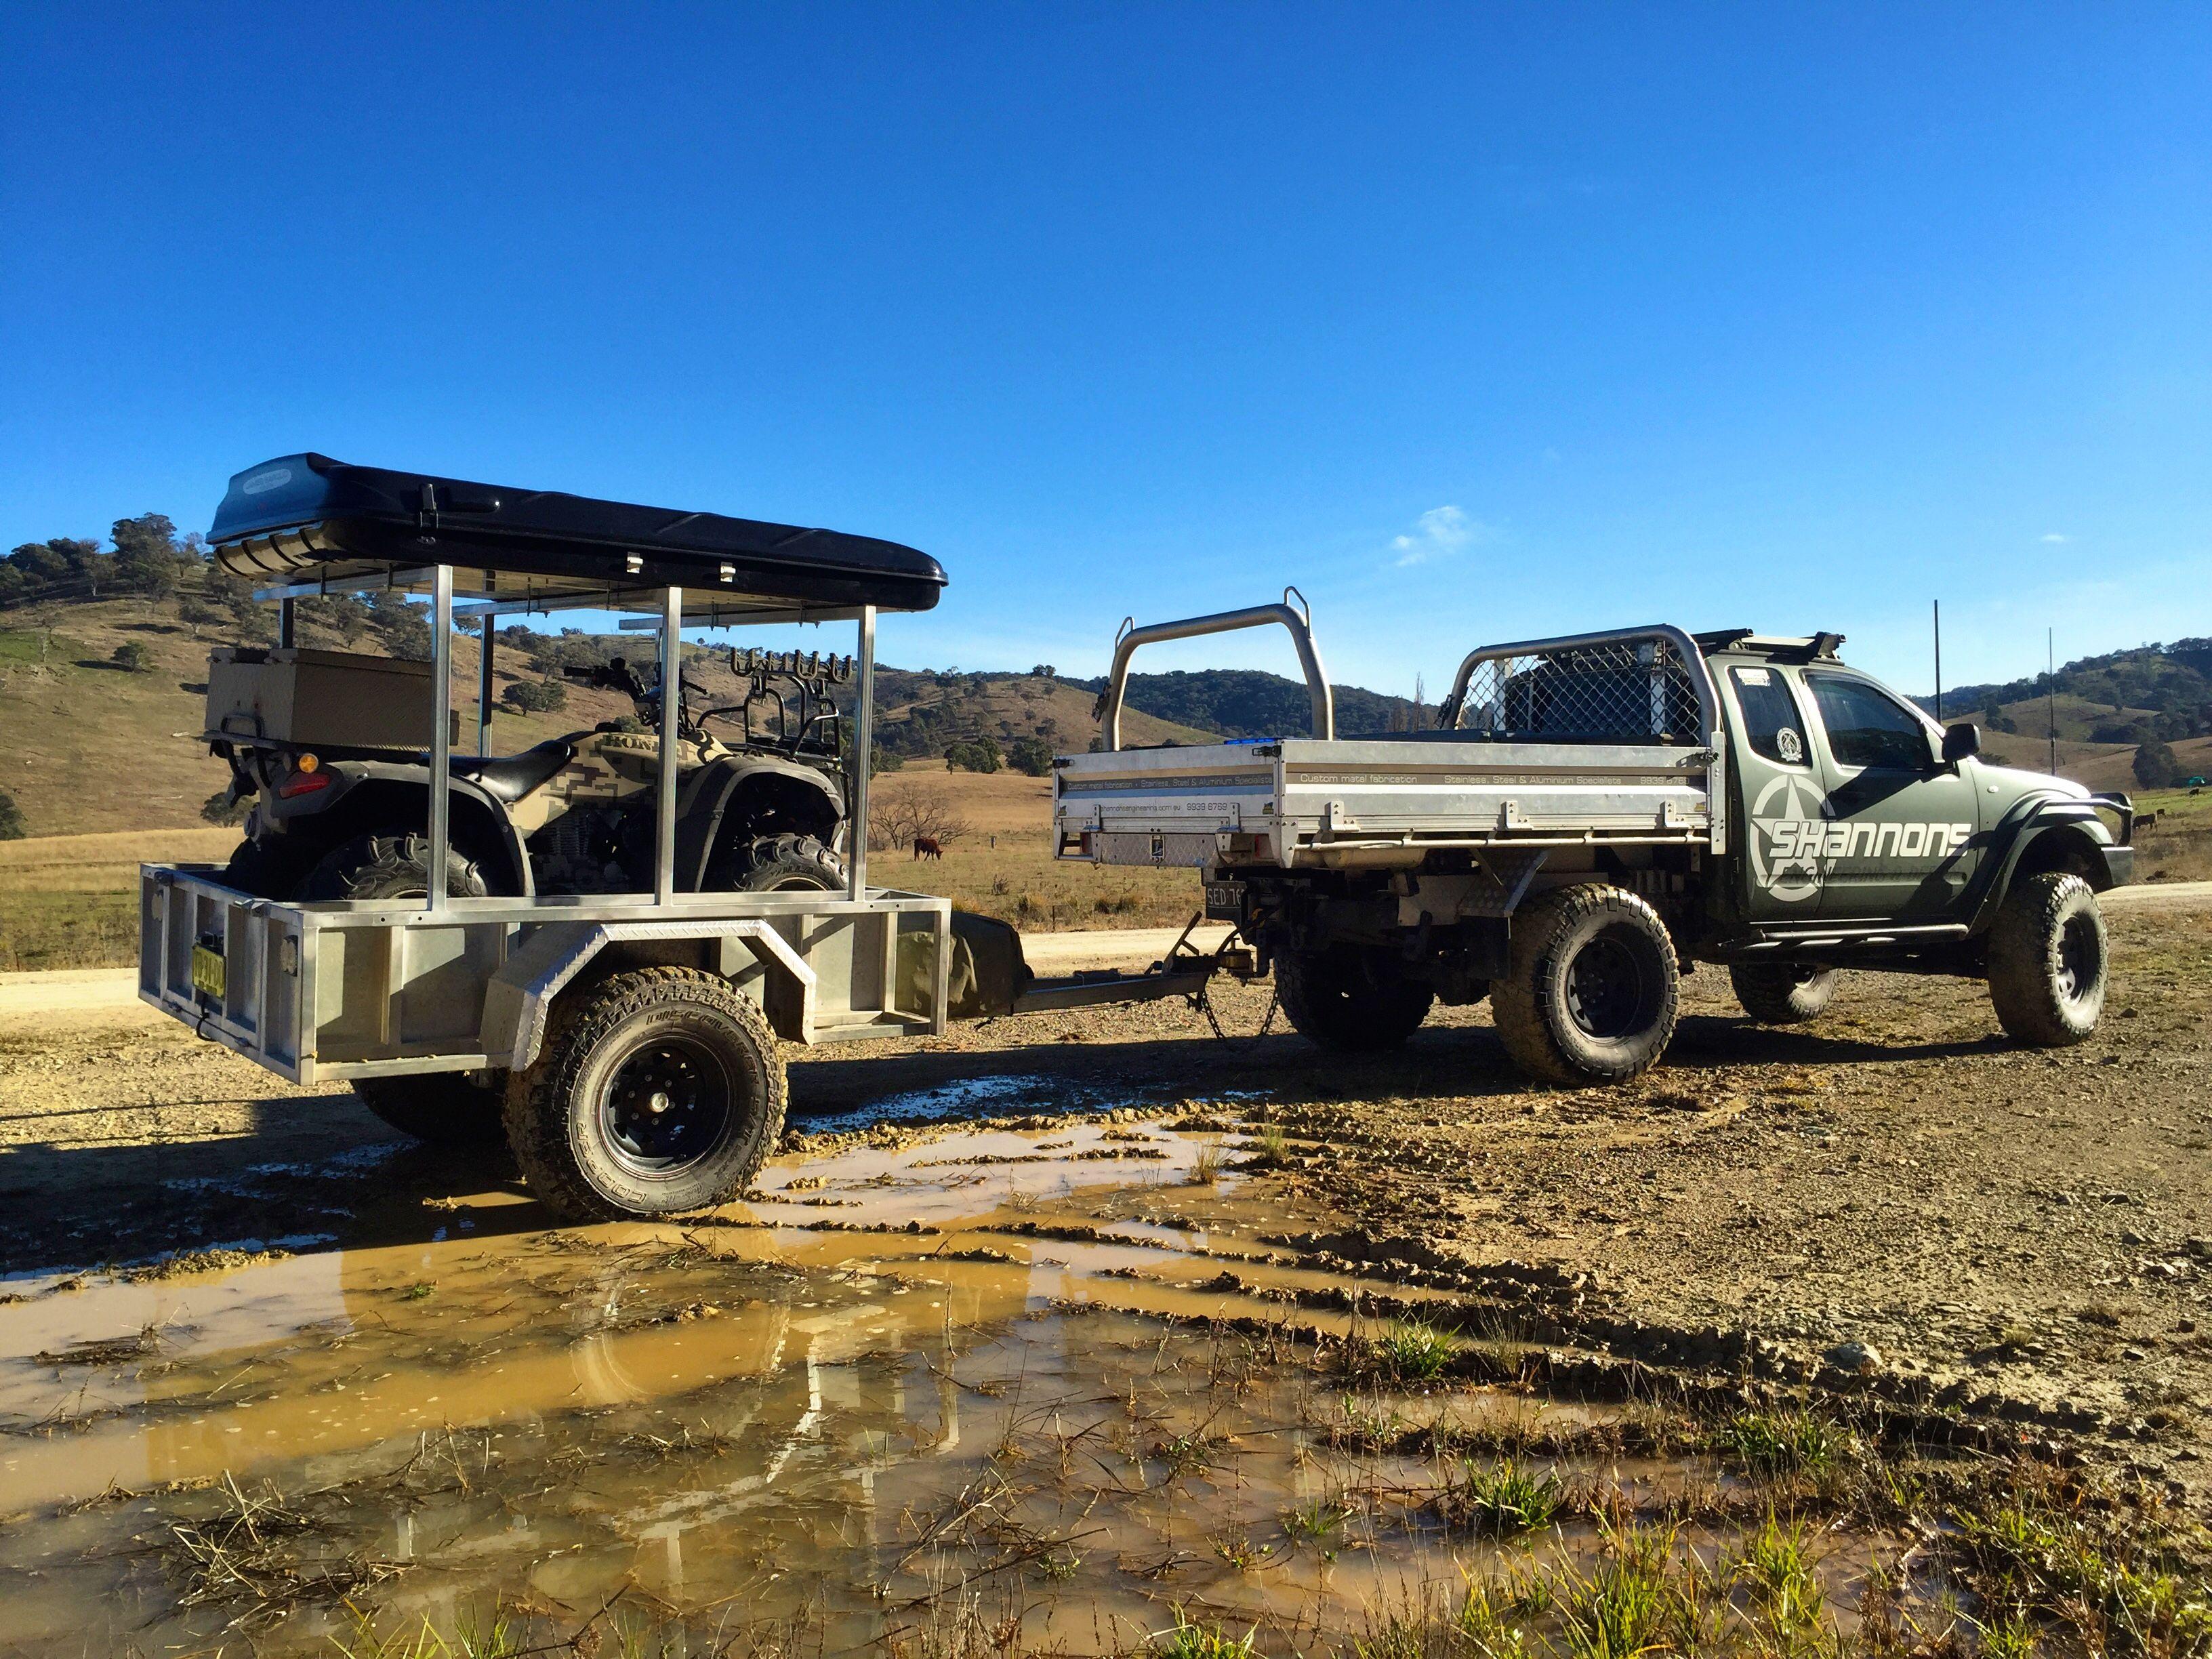 Diy Off Road Camper Truck - Year of Clean Water